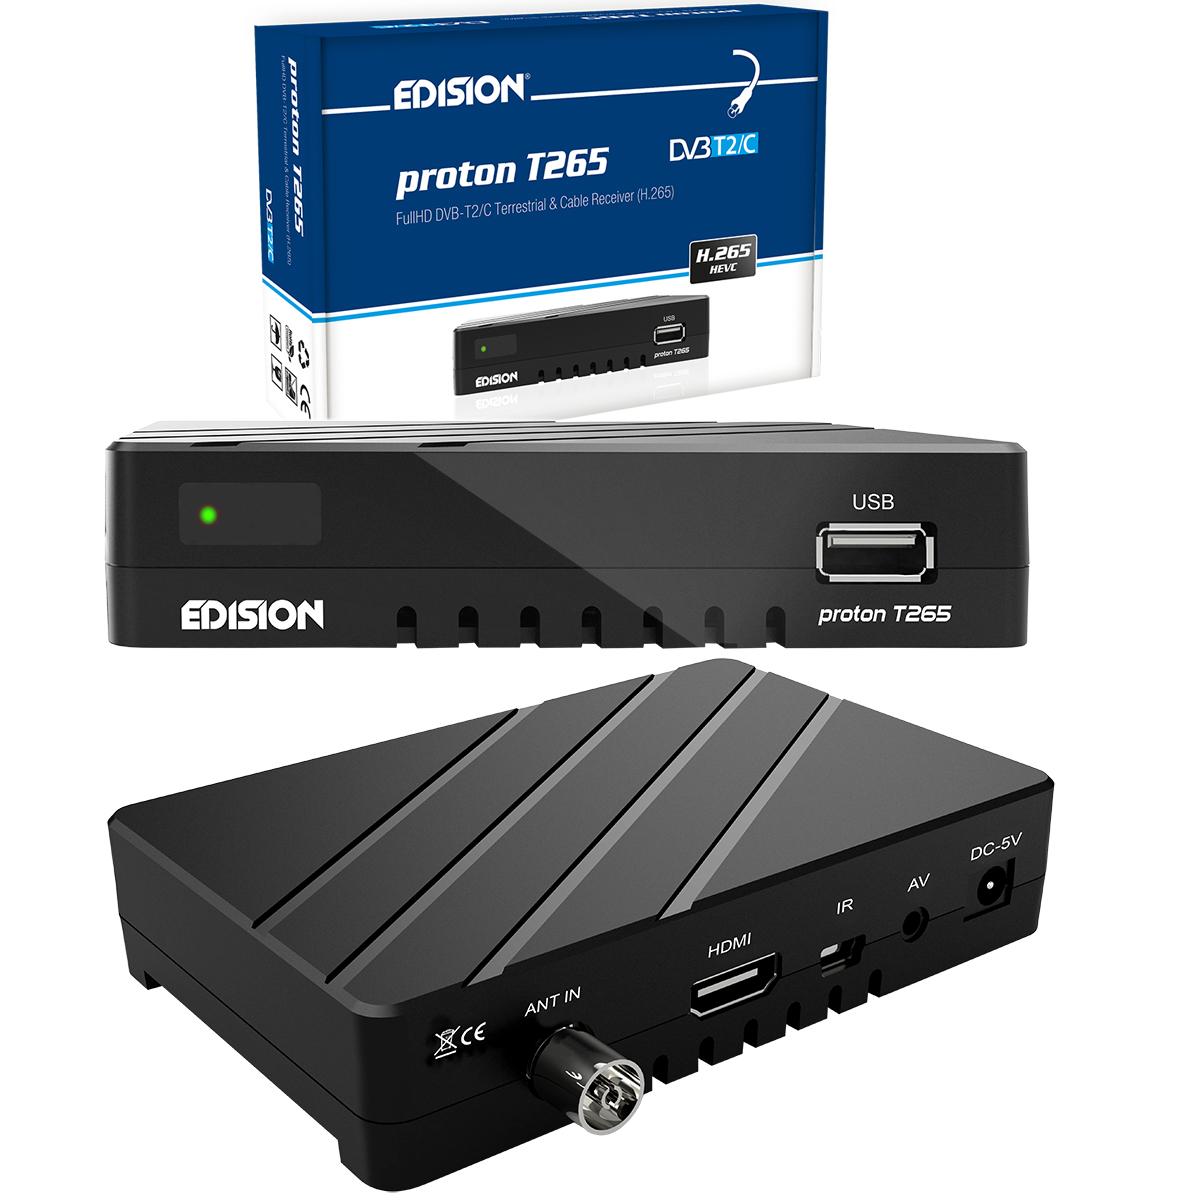 FullHD DVB-T2 DVB-T HDTV Receiver HEVC H.265 Digital HD + Aktive DVB-T2 DVB-T Antenne Außenantenne 28dB mit 4G LTE Filter + 1m HDMI Kabel PremiumX